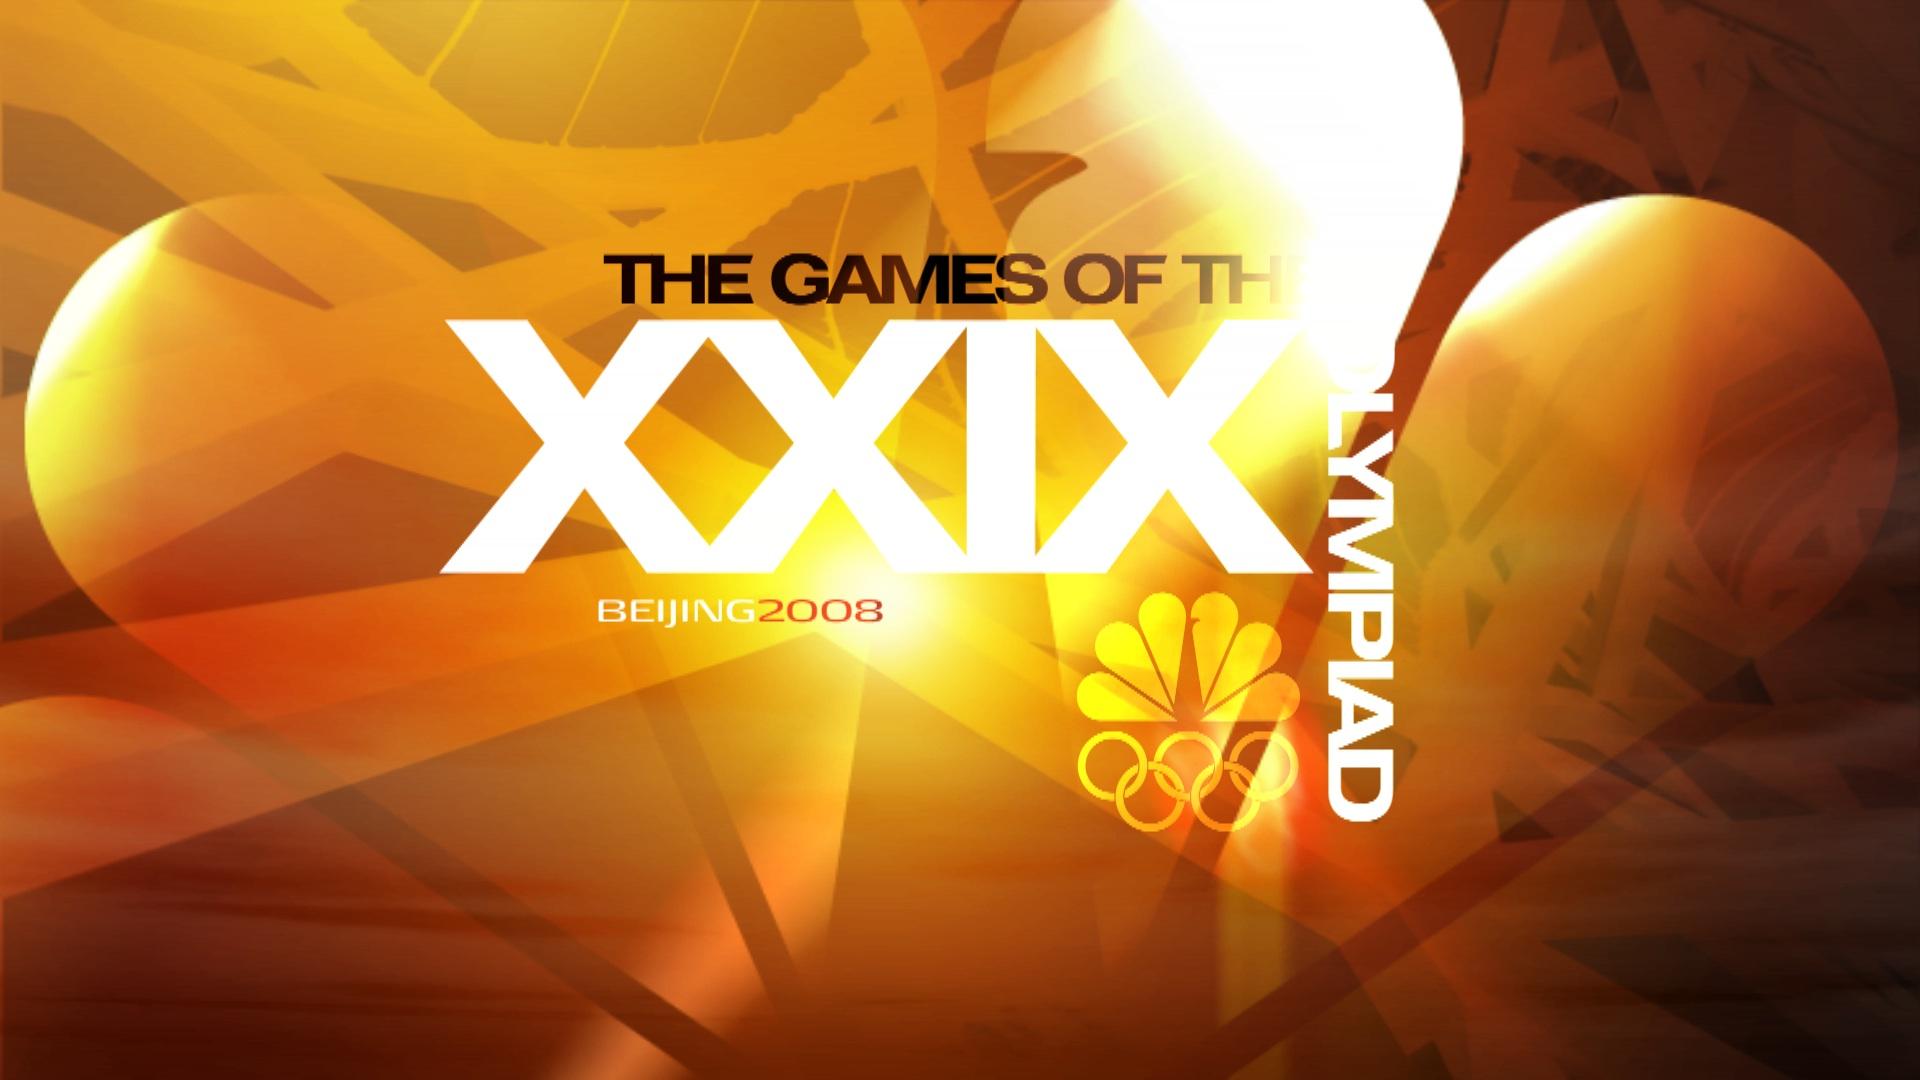 GAMES OF THE XXIX OLYMPIAD - NBC OLYMPICS